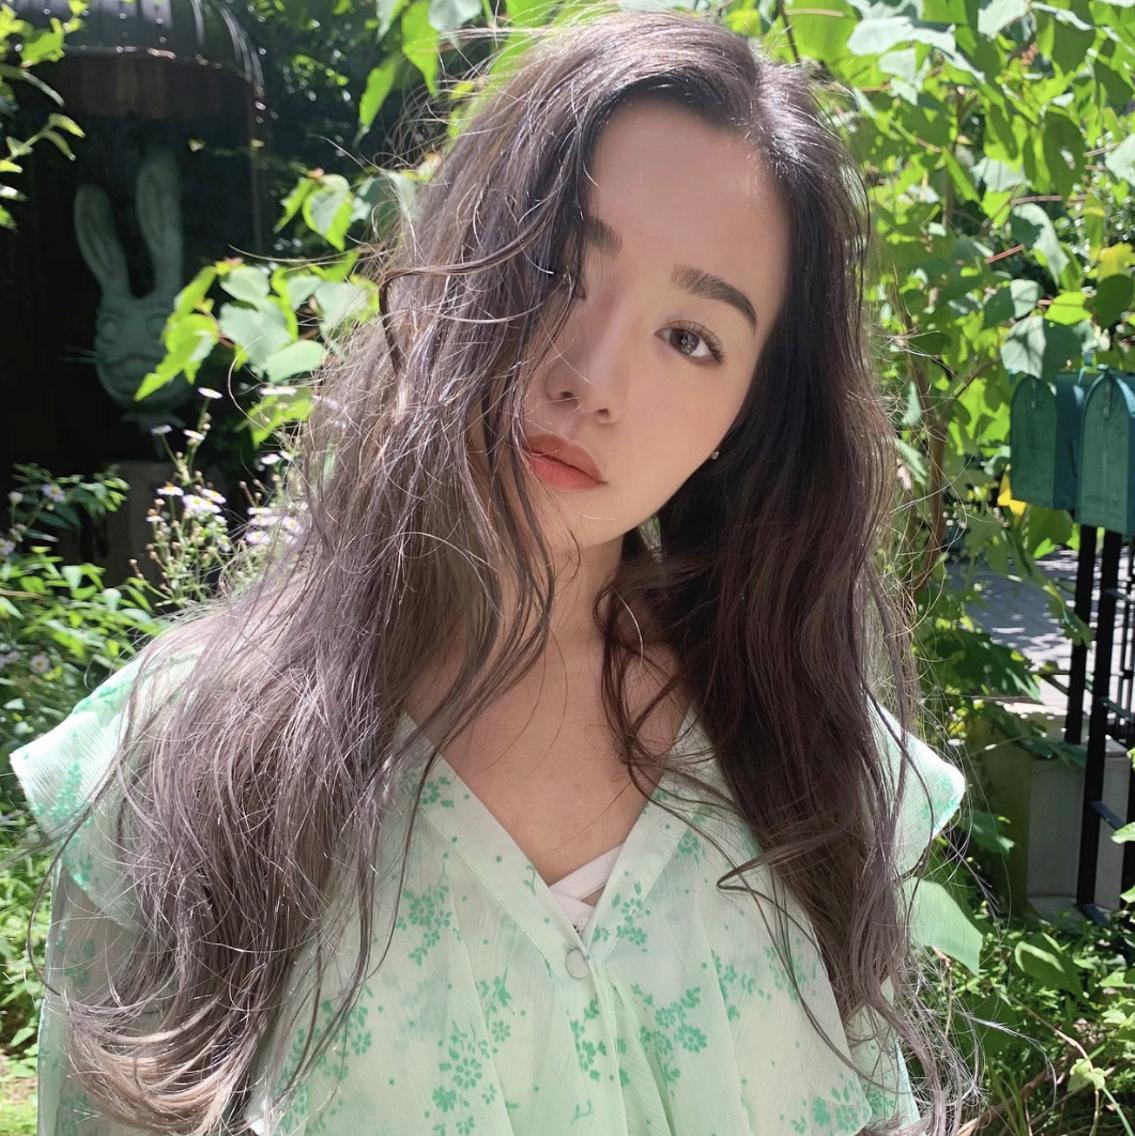 Omotesando beauty salon P A P E R表参道店所属・【トップデザイナー】 A i r iの掲載